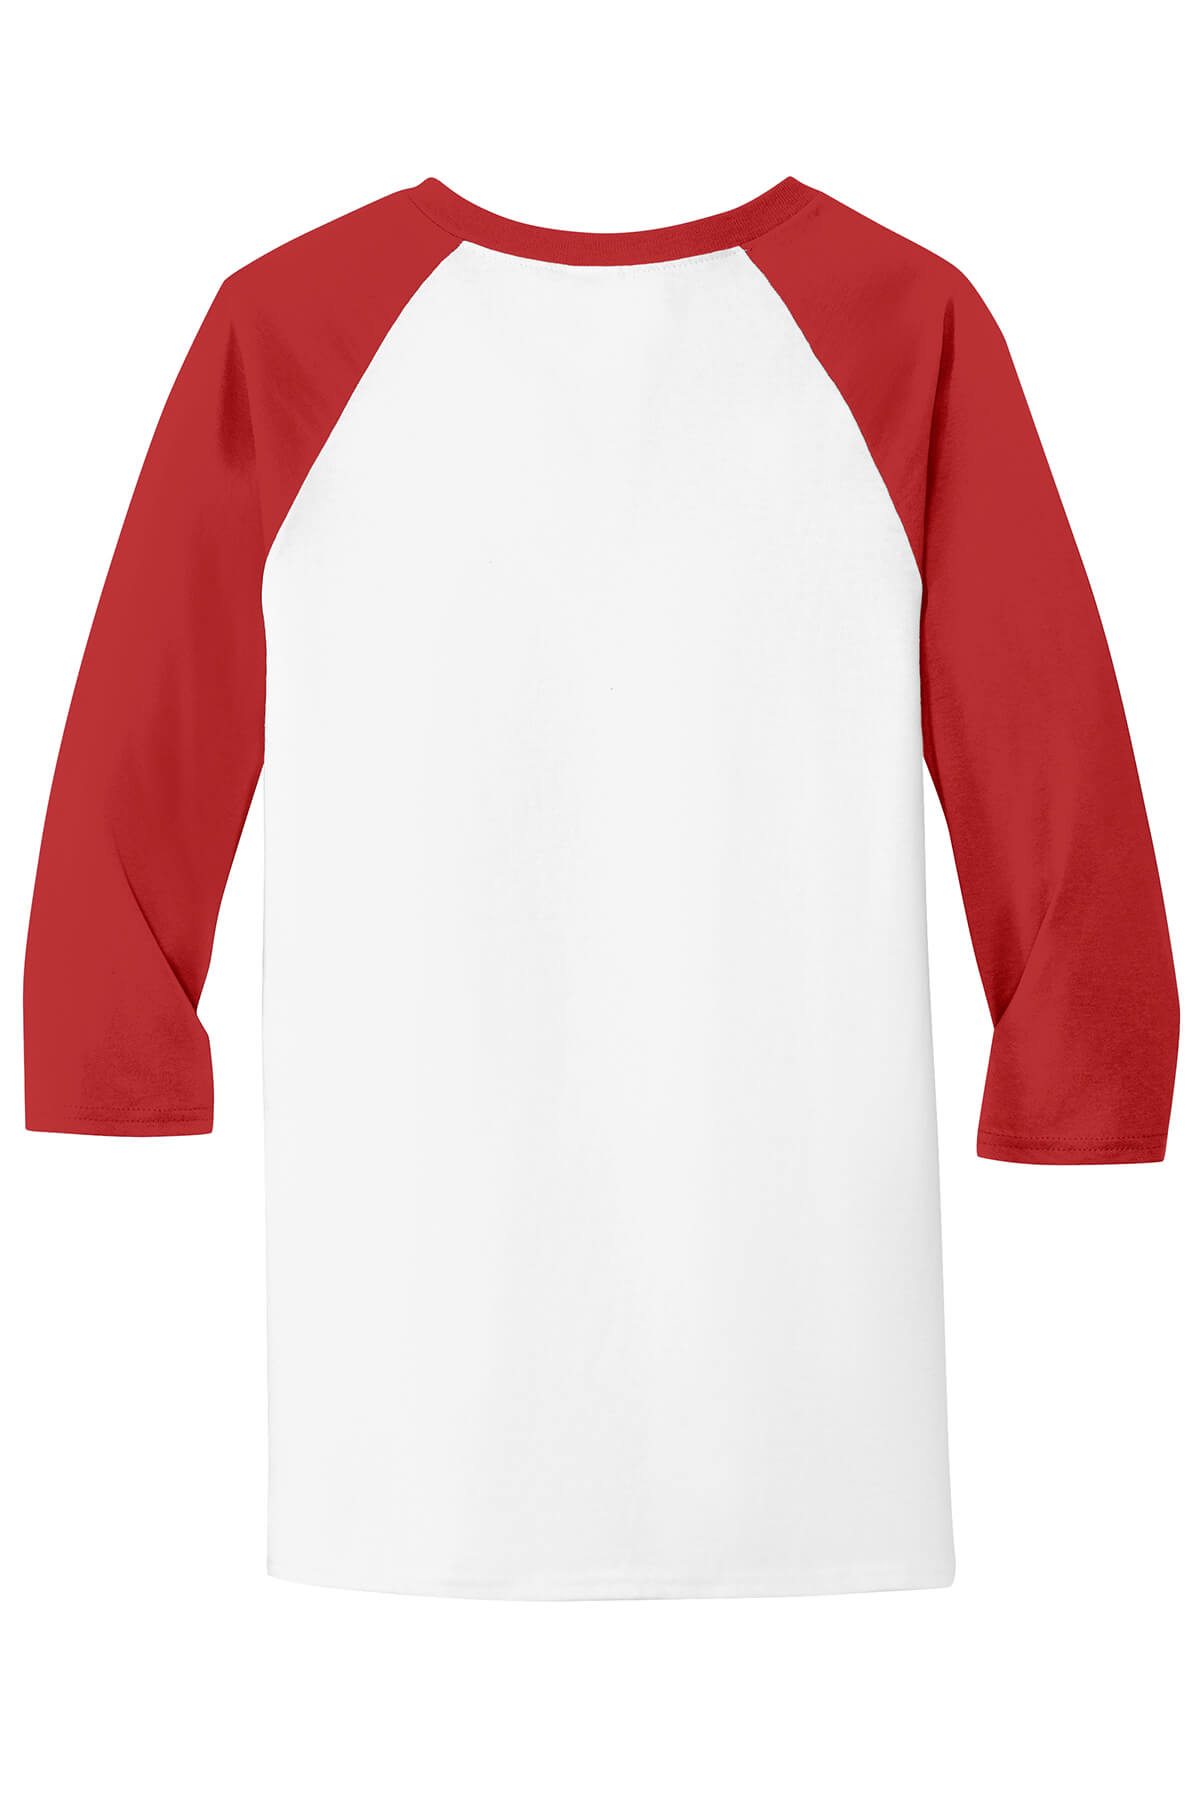 5700-white-red-6